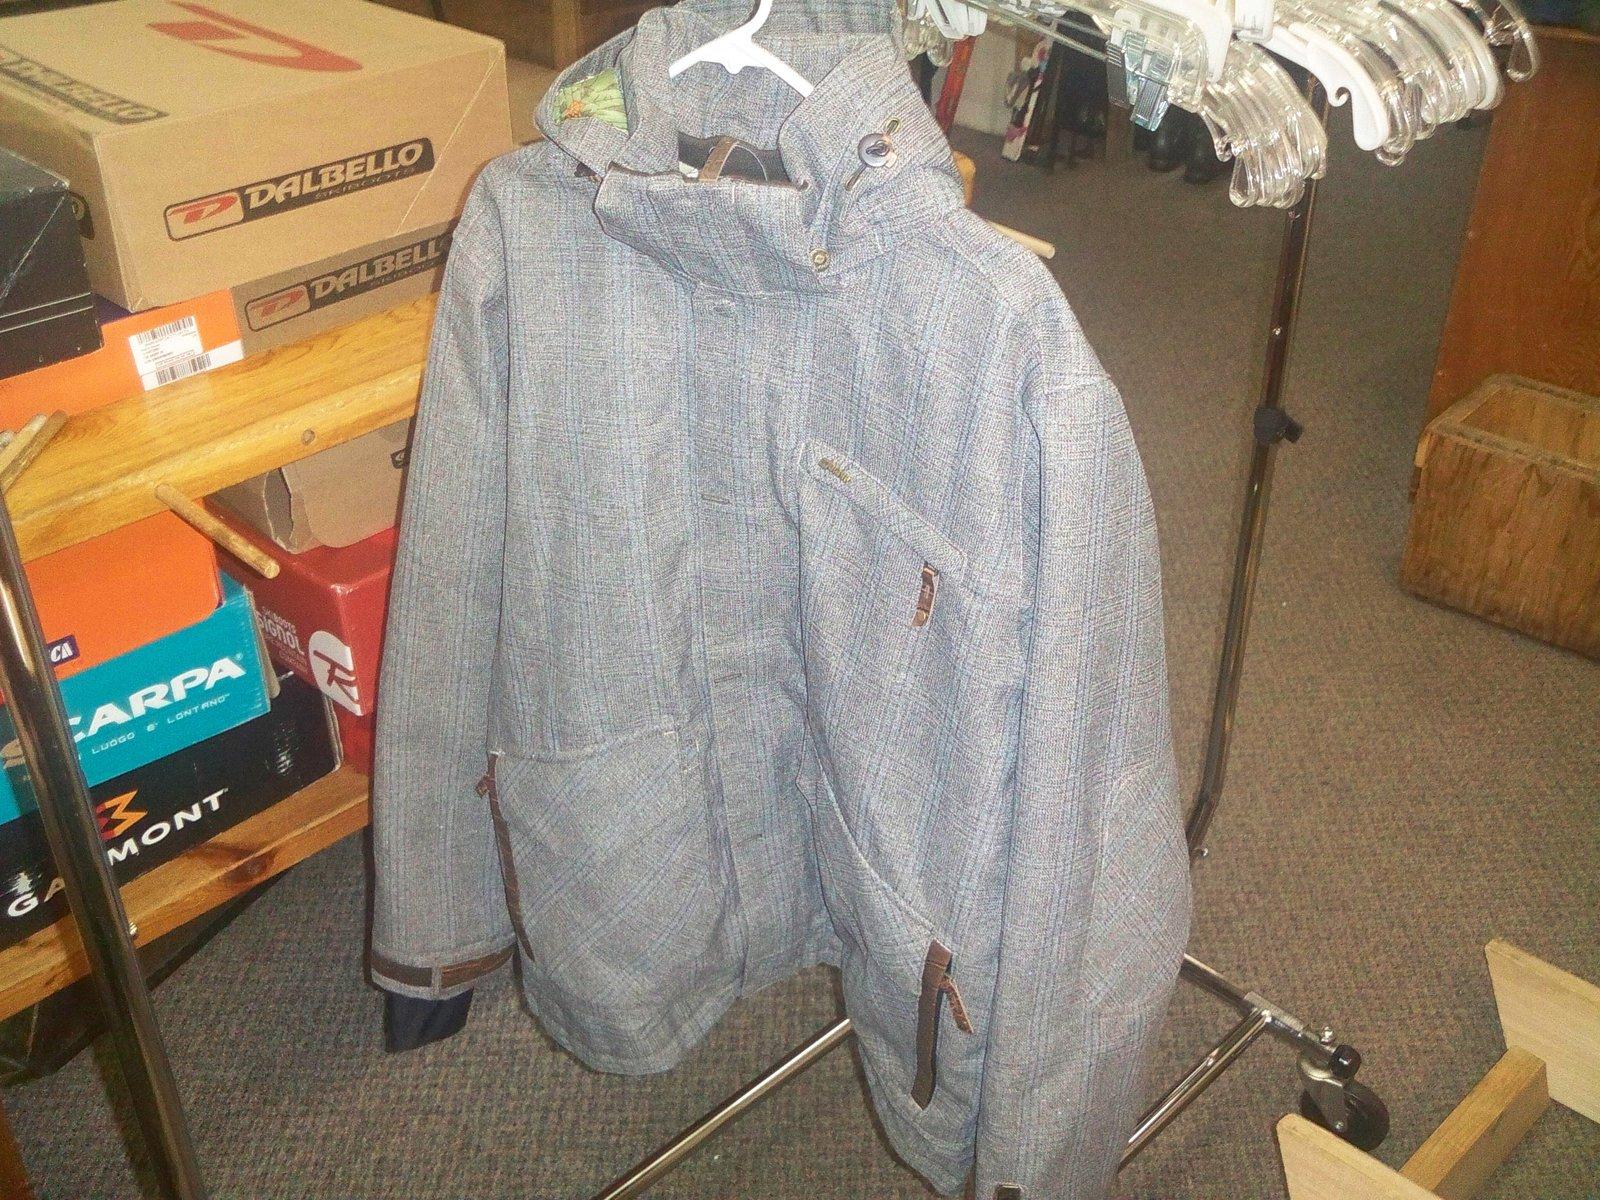 Tj schil jacket